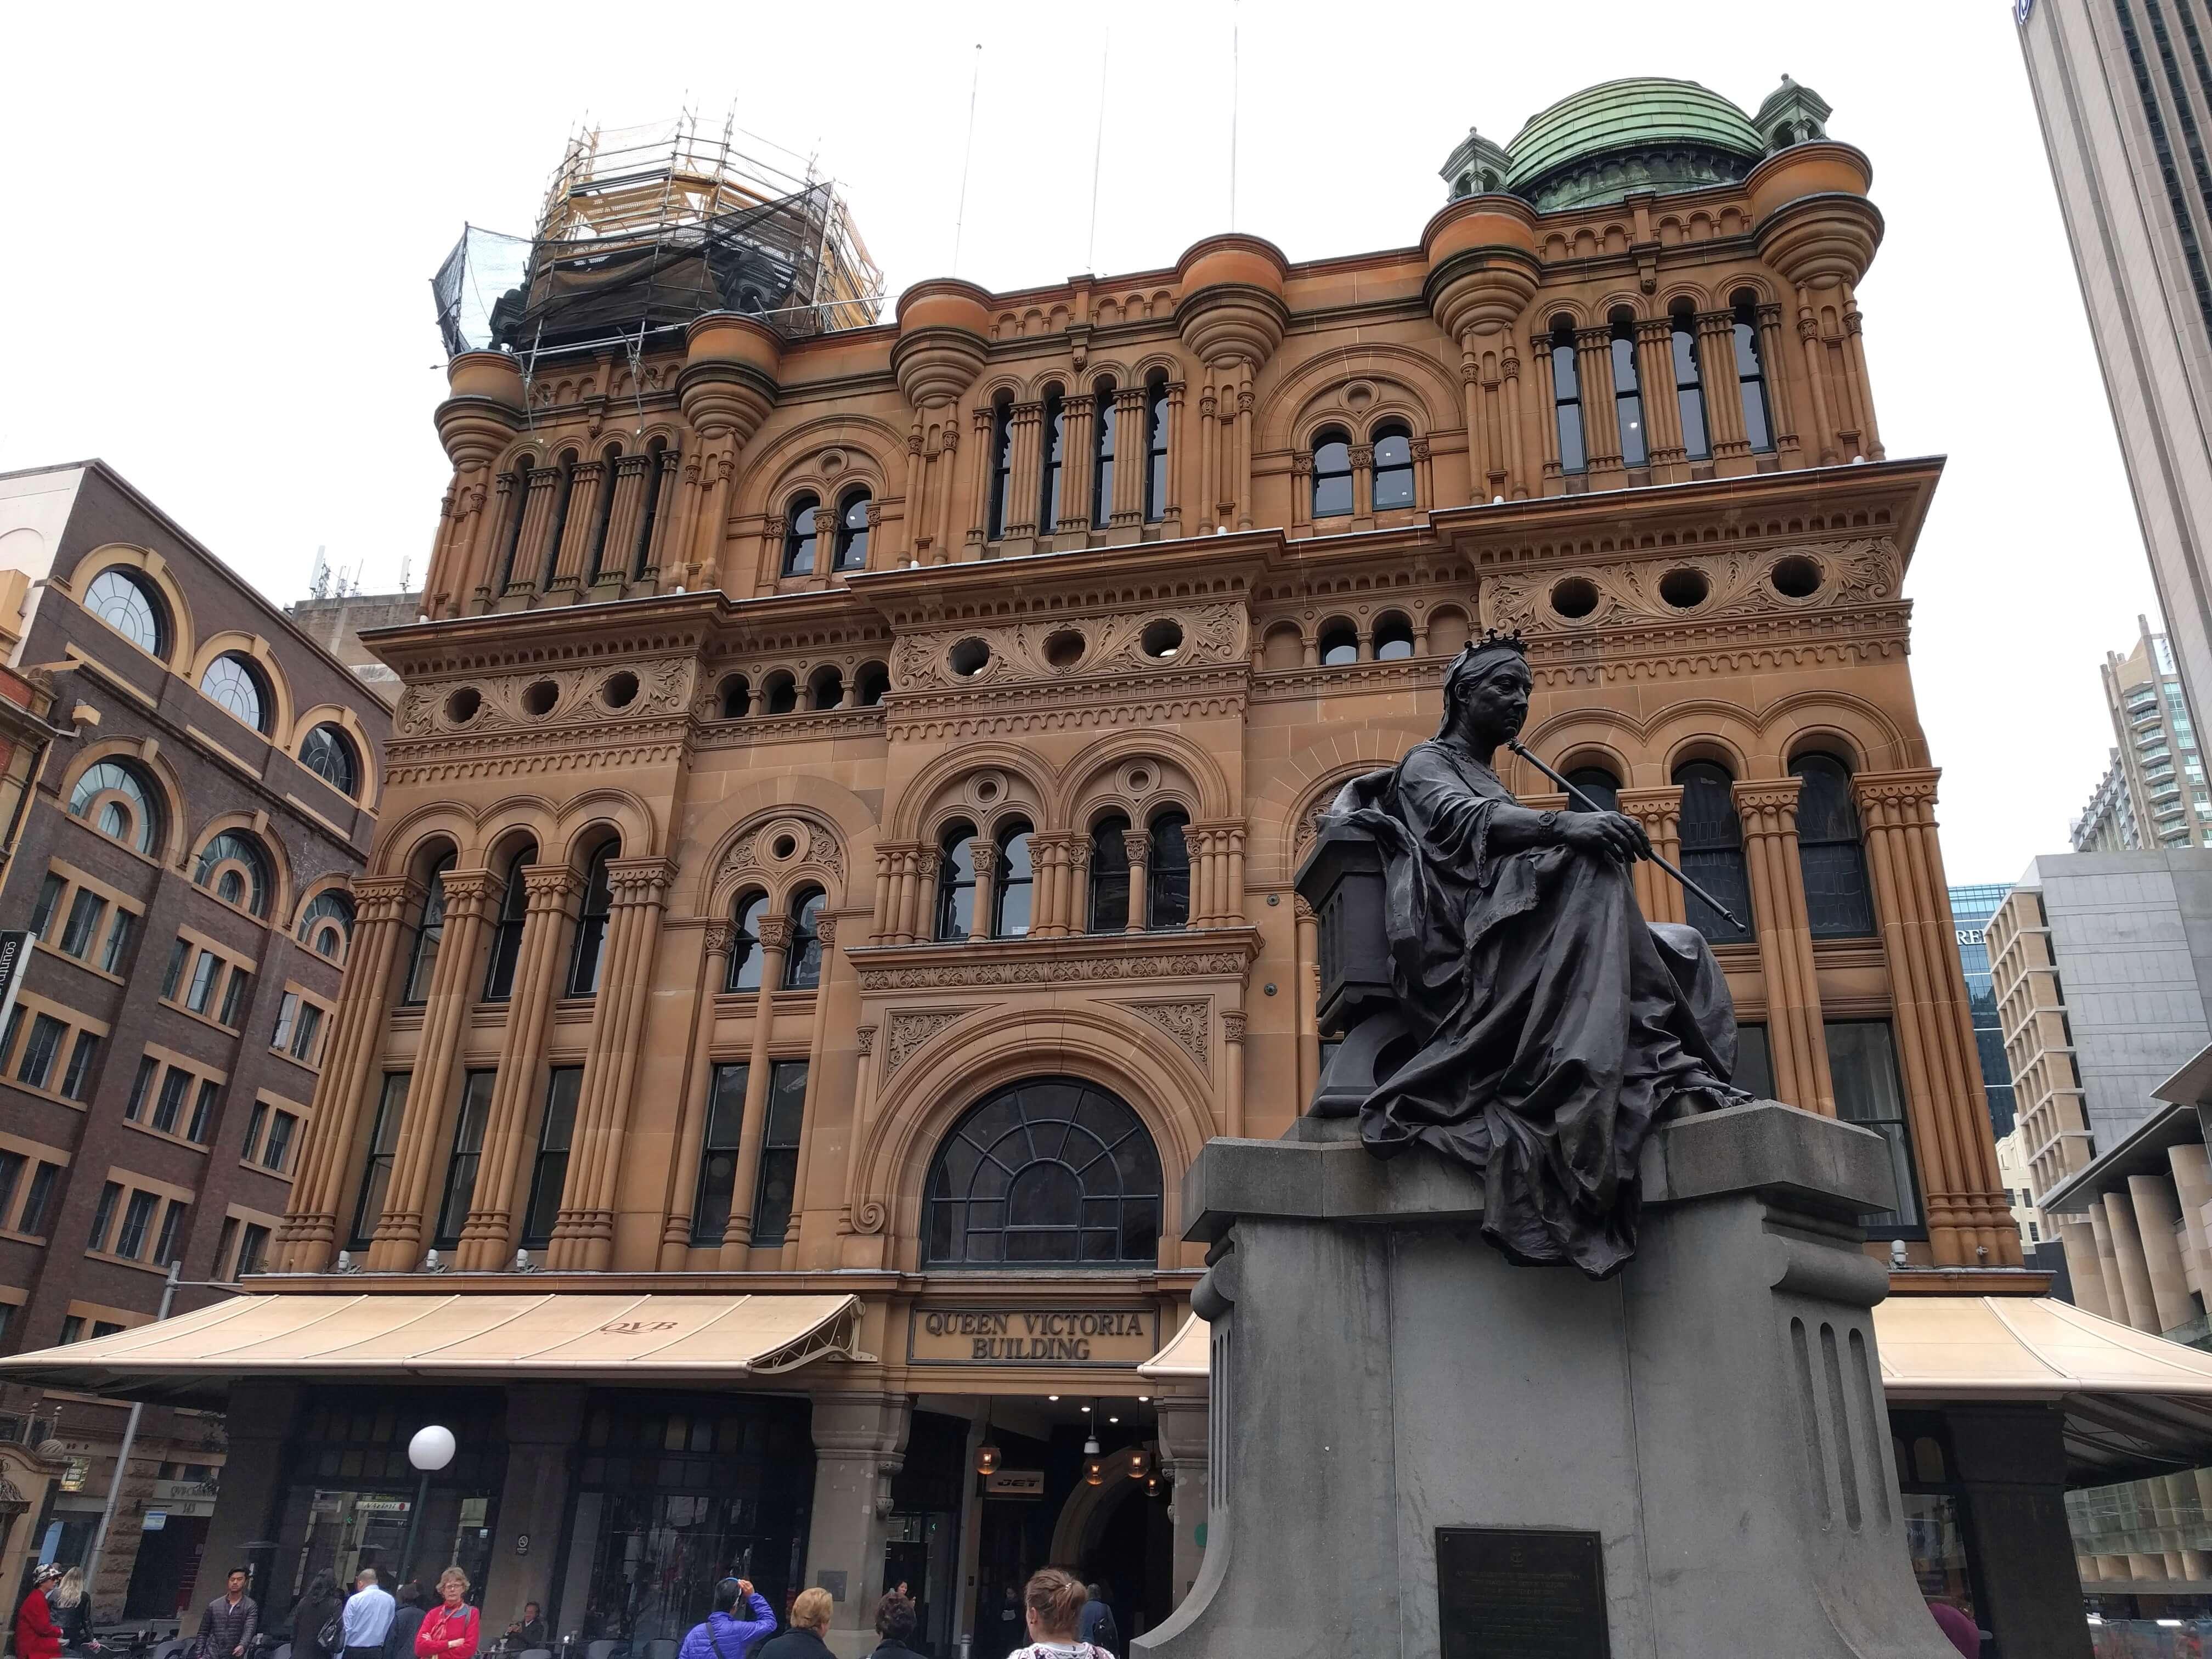 Queen Victoria Building, Sydney, Australia | CruiseBe.com